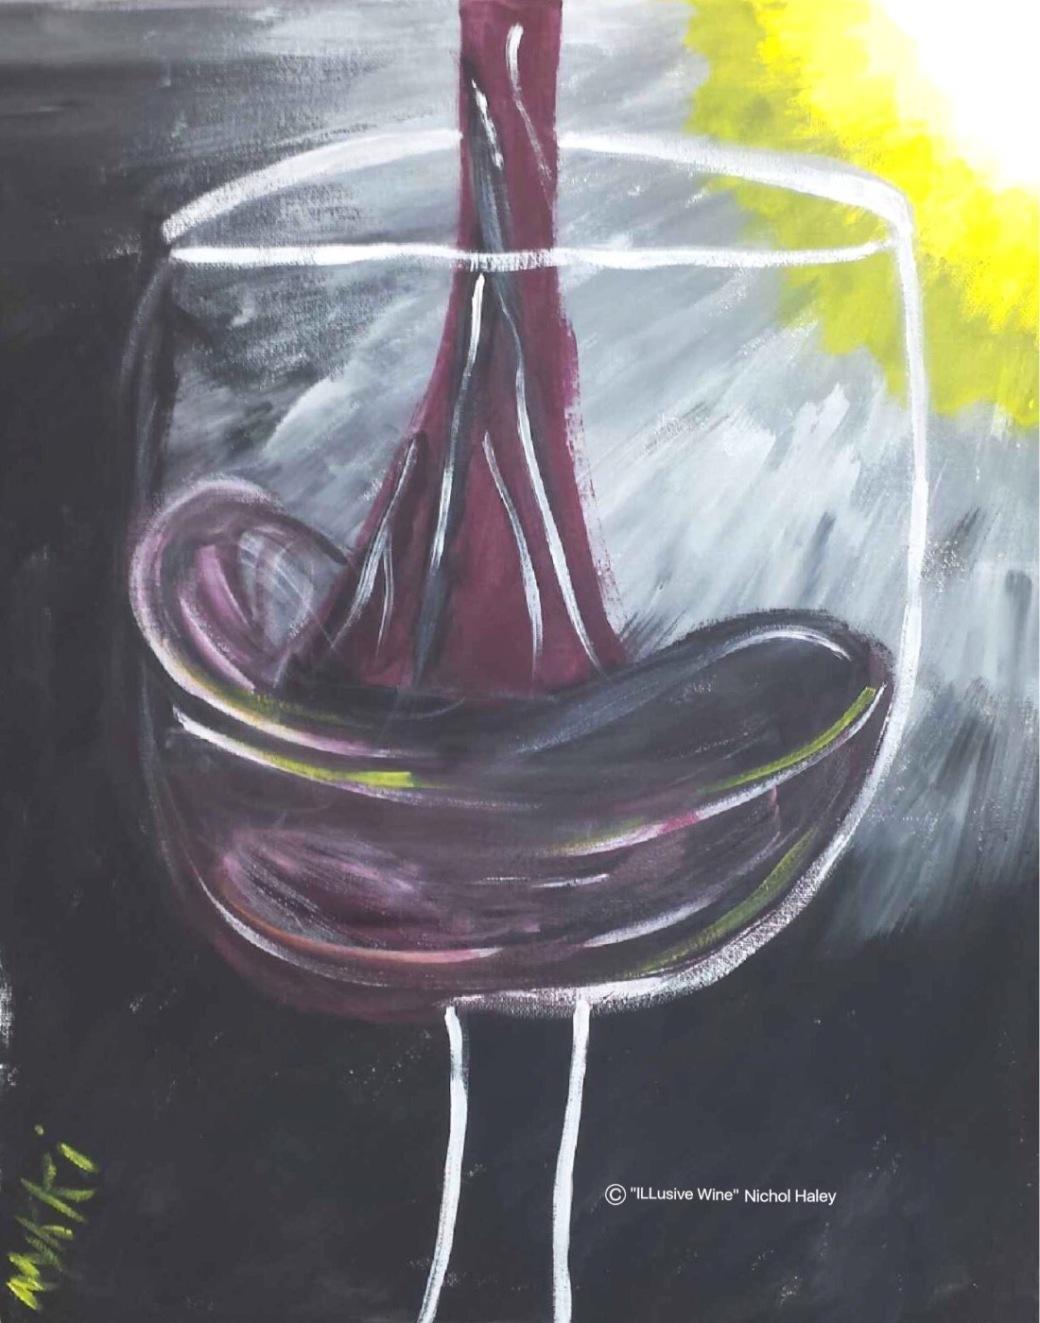 ILLusive Wine Acrylic: 11x14 Nichol Haley